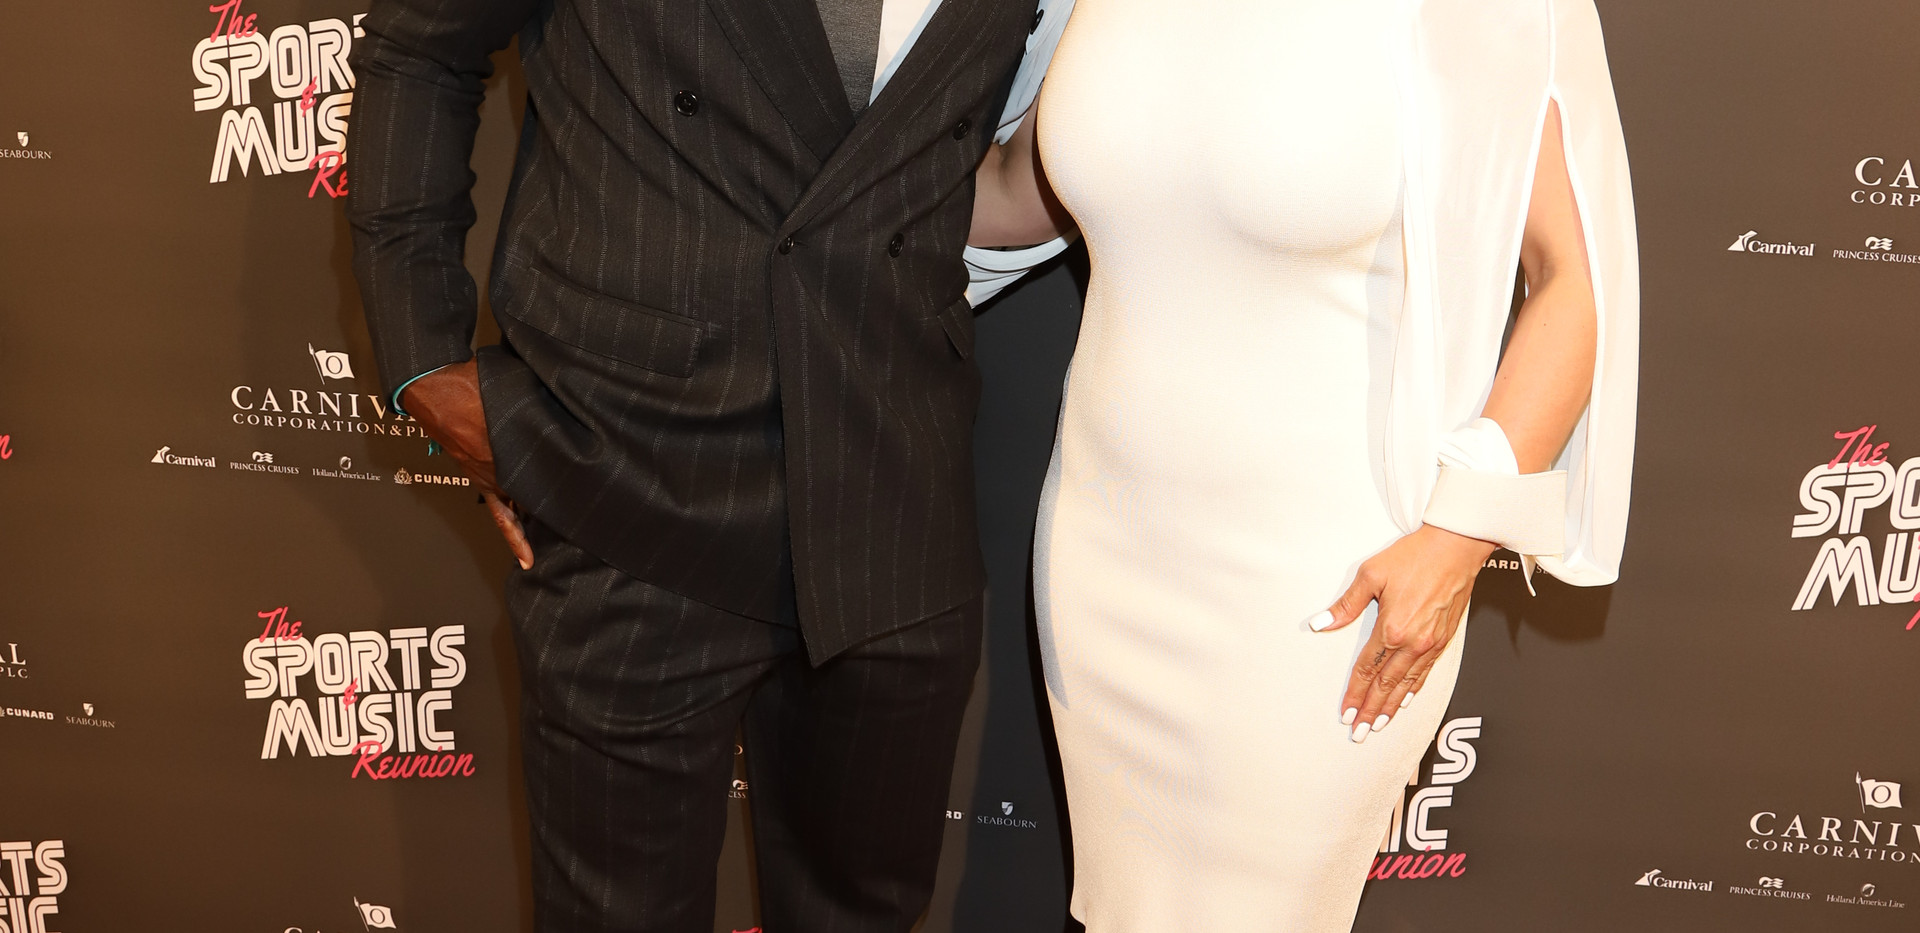 Terry & Rebecca Crews - Sports & Music Reunion